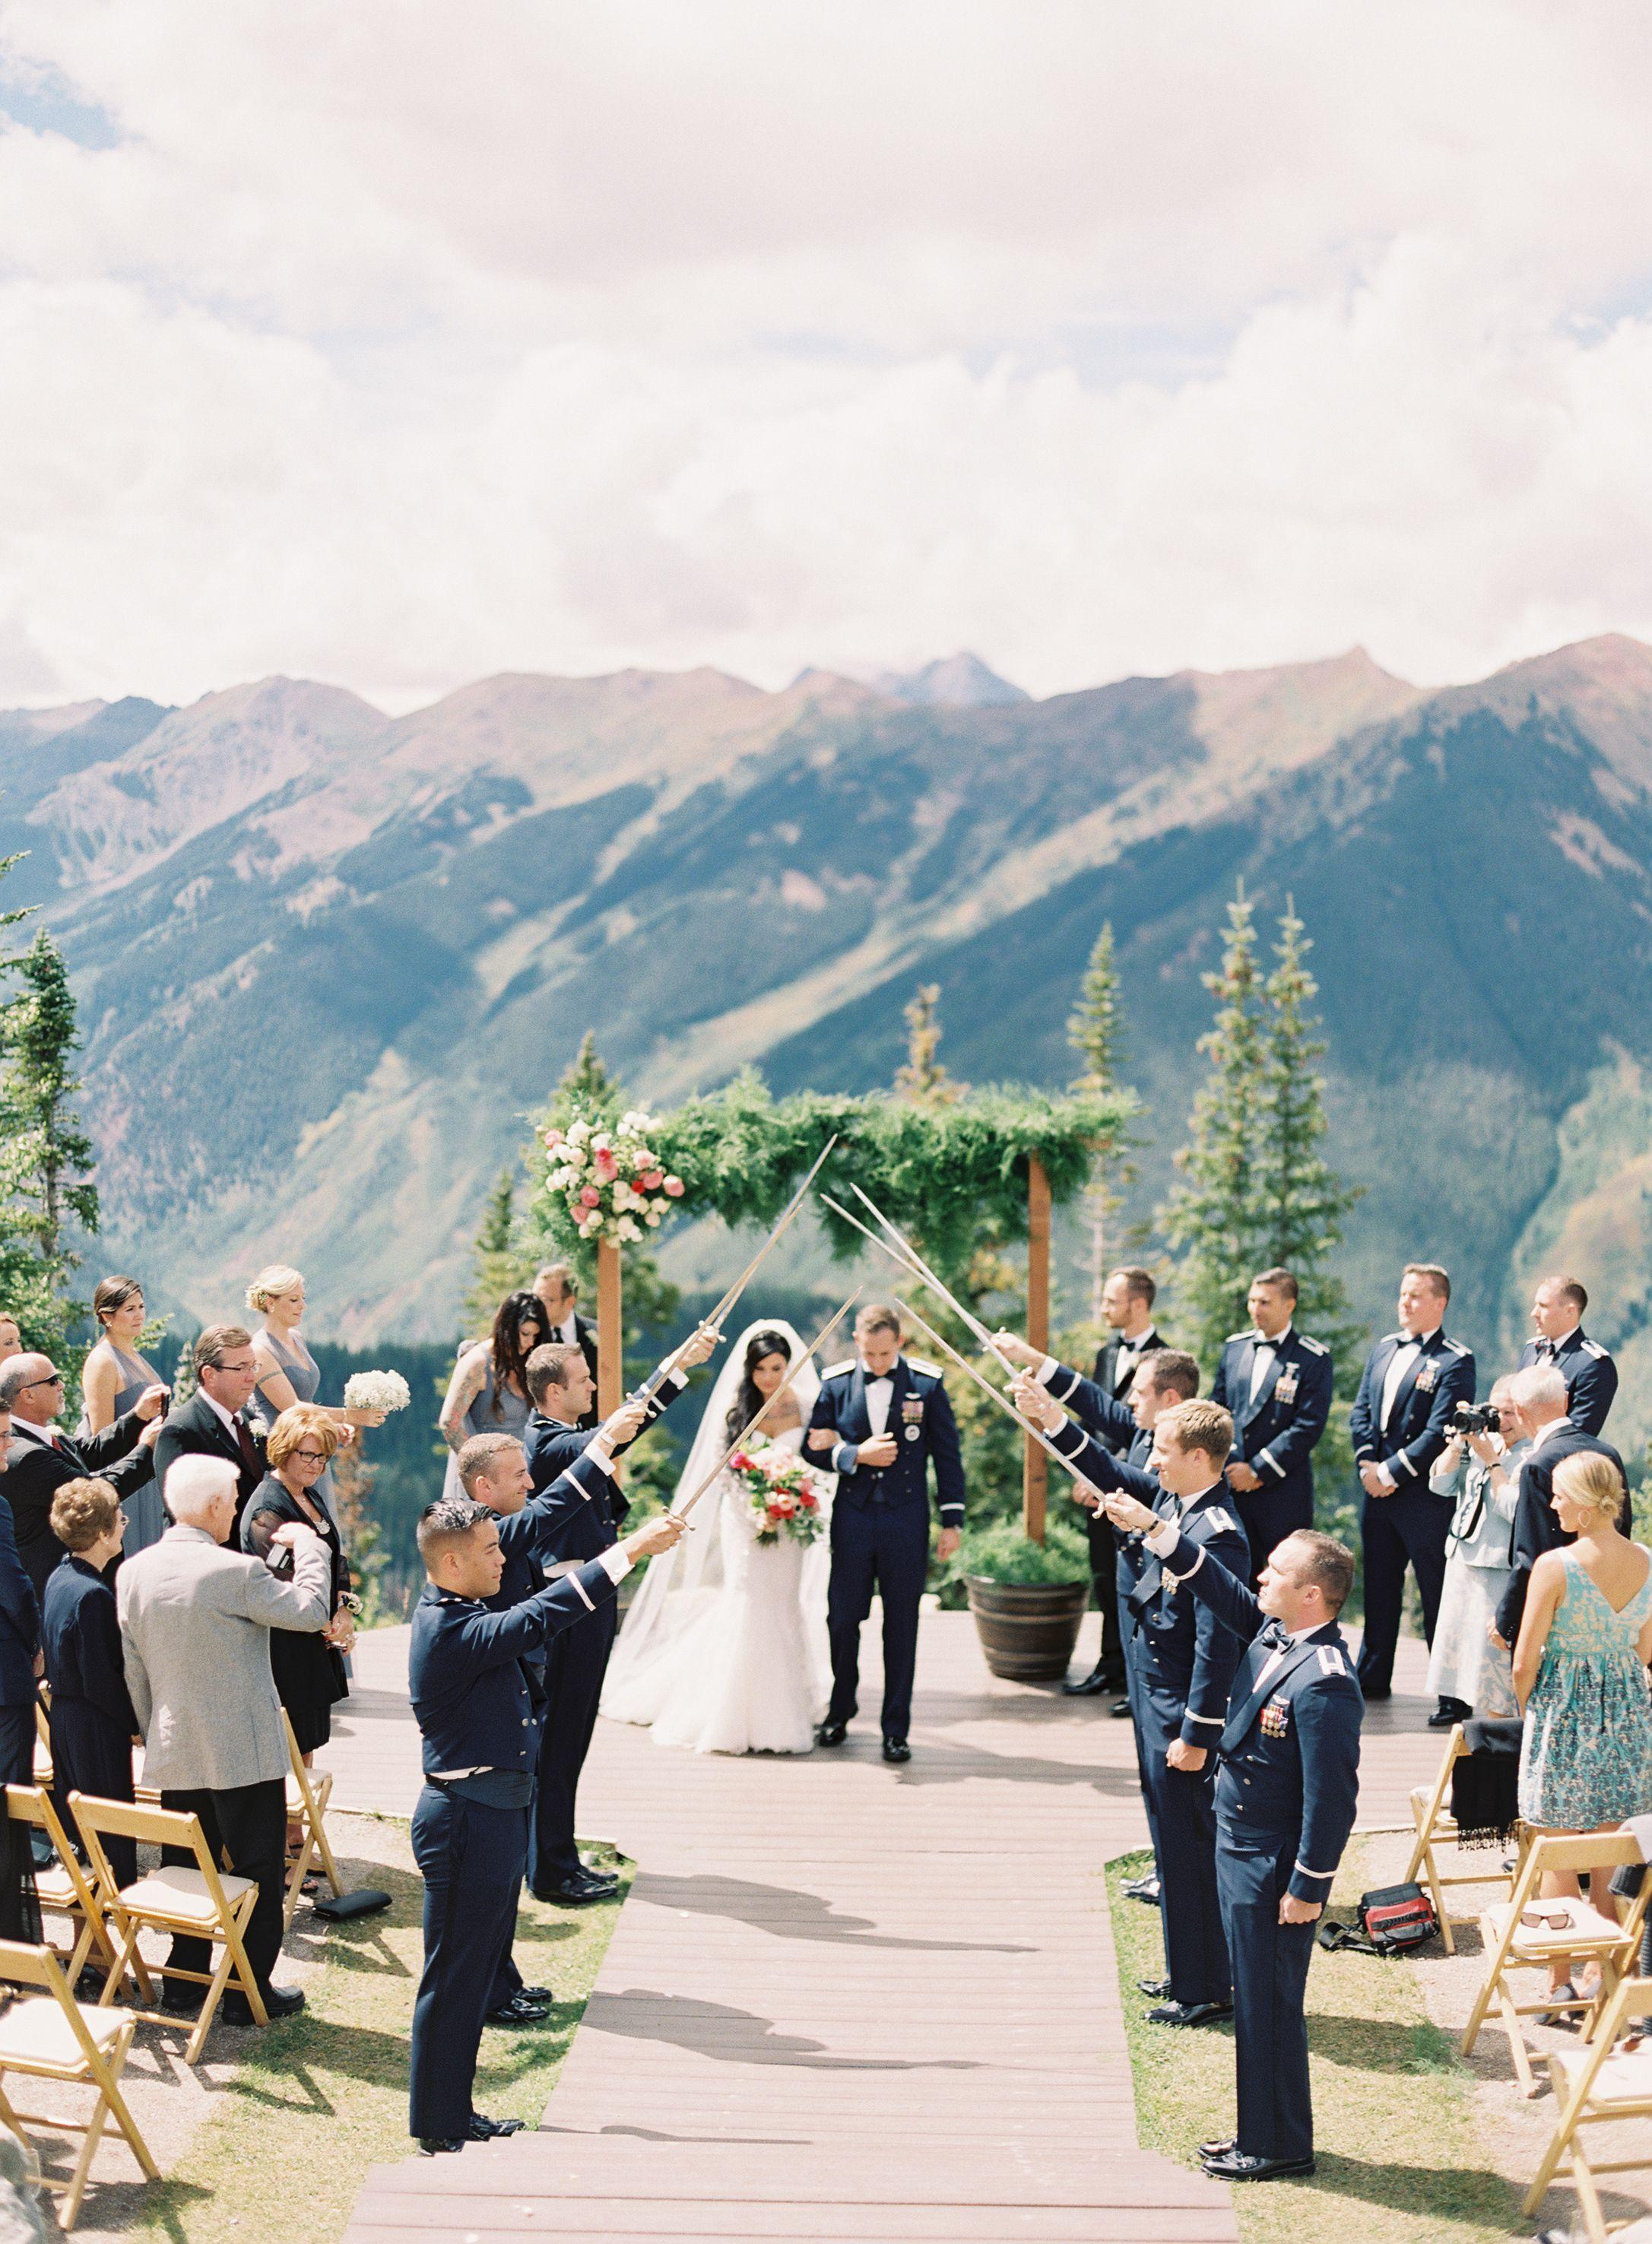 Andy & Paul's Destination Aspen Wedding Aspen colorado